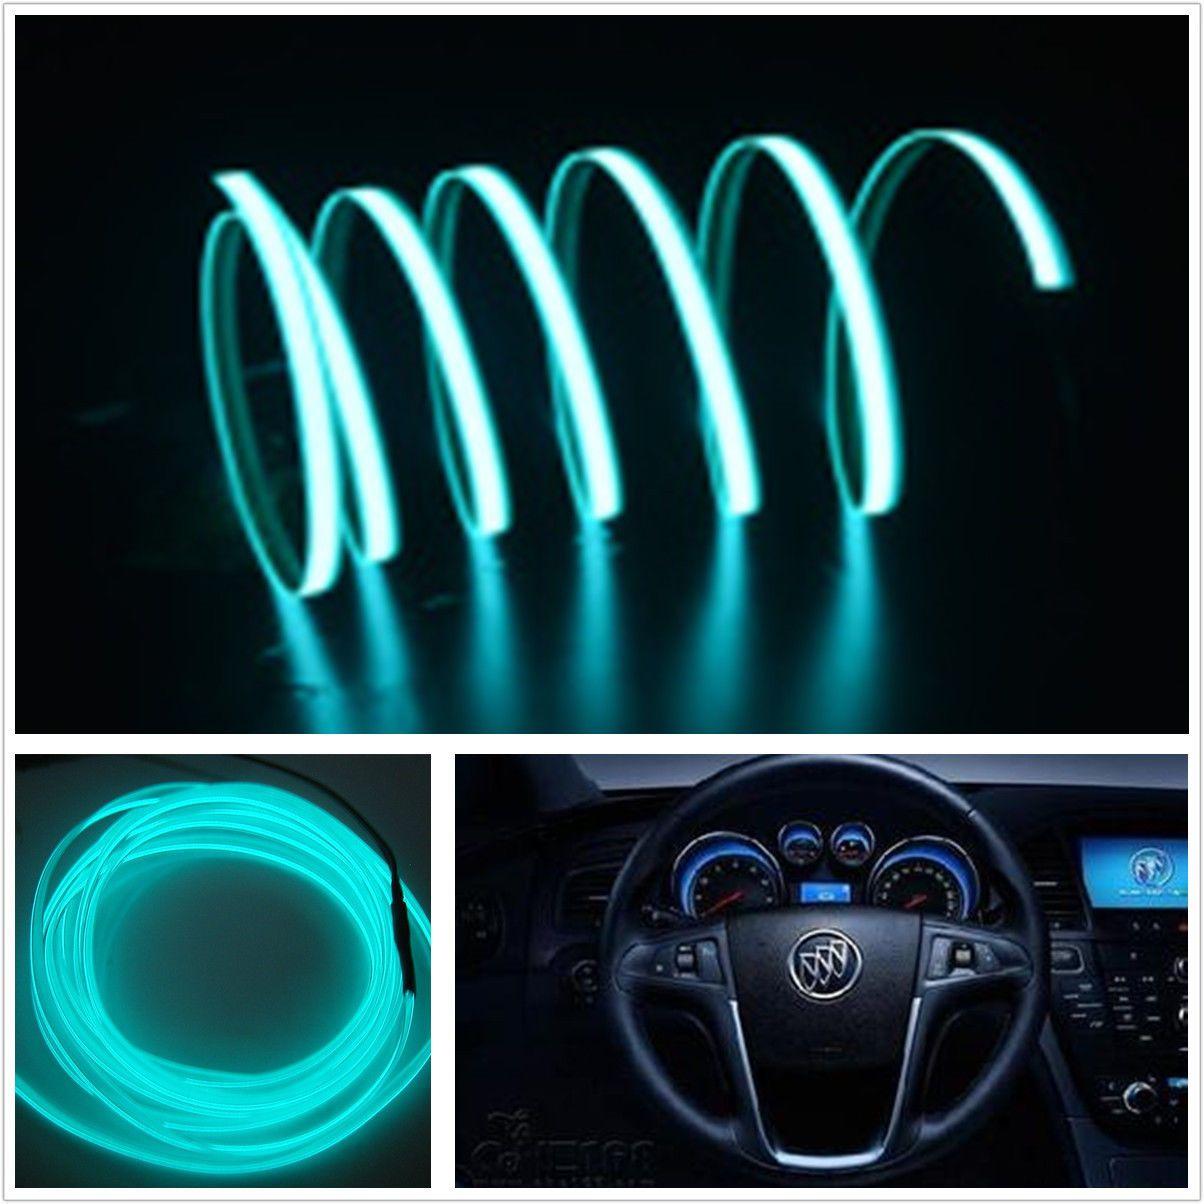 2M ICE BLUE EL Wire Car SUV Unique Decor Fluorescent Strip Neon Lamp Cold  Light Interior Trim Decorative Strip Online With $8.64/Piece On Hero_88u0027s  Store ...